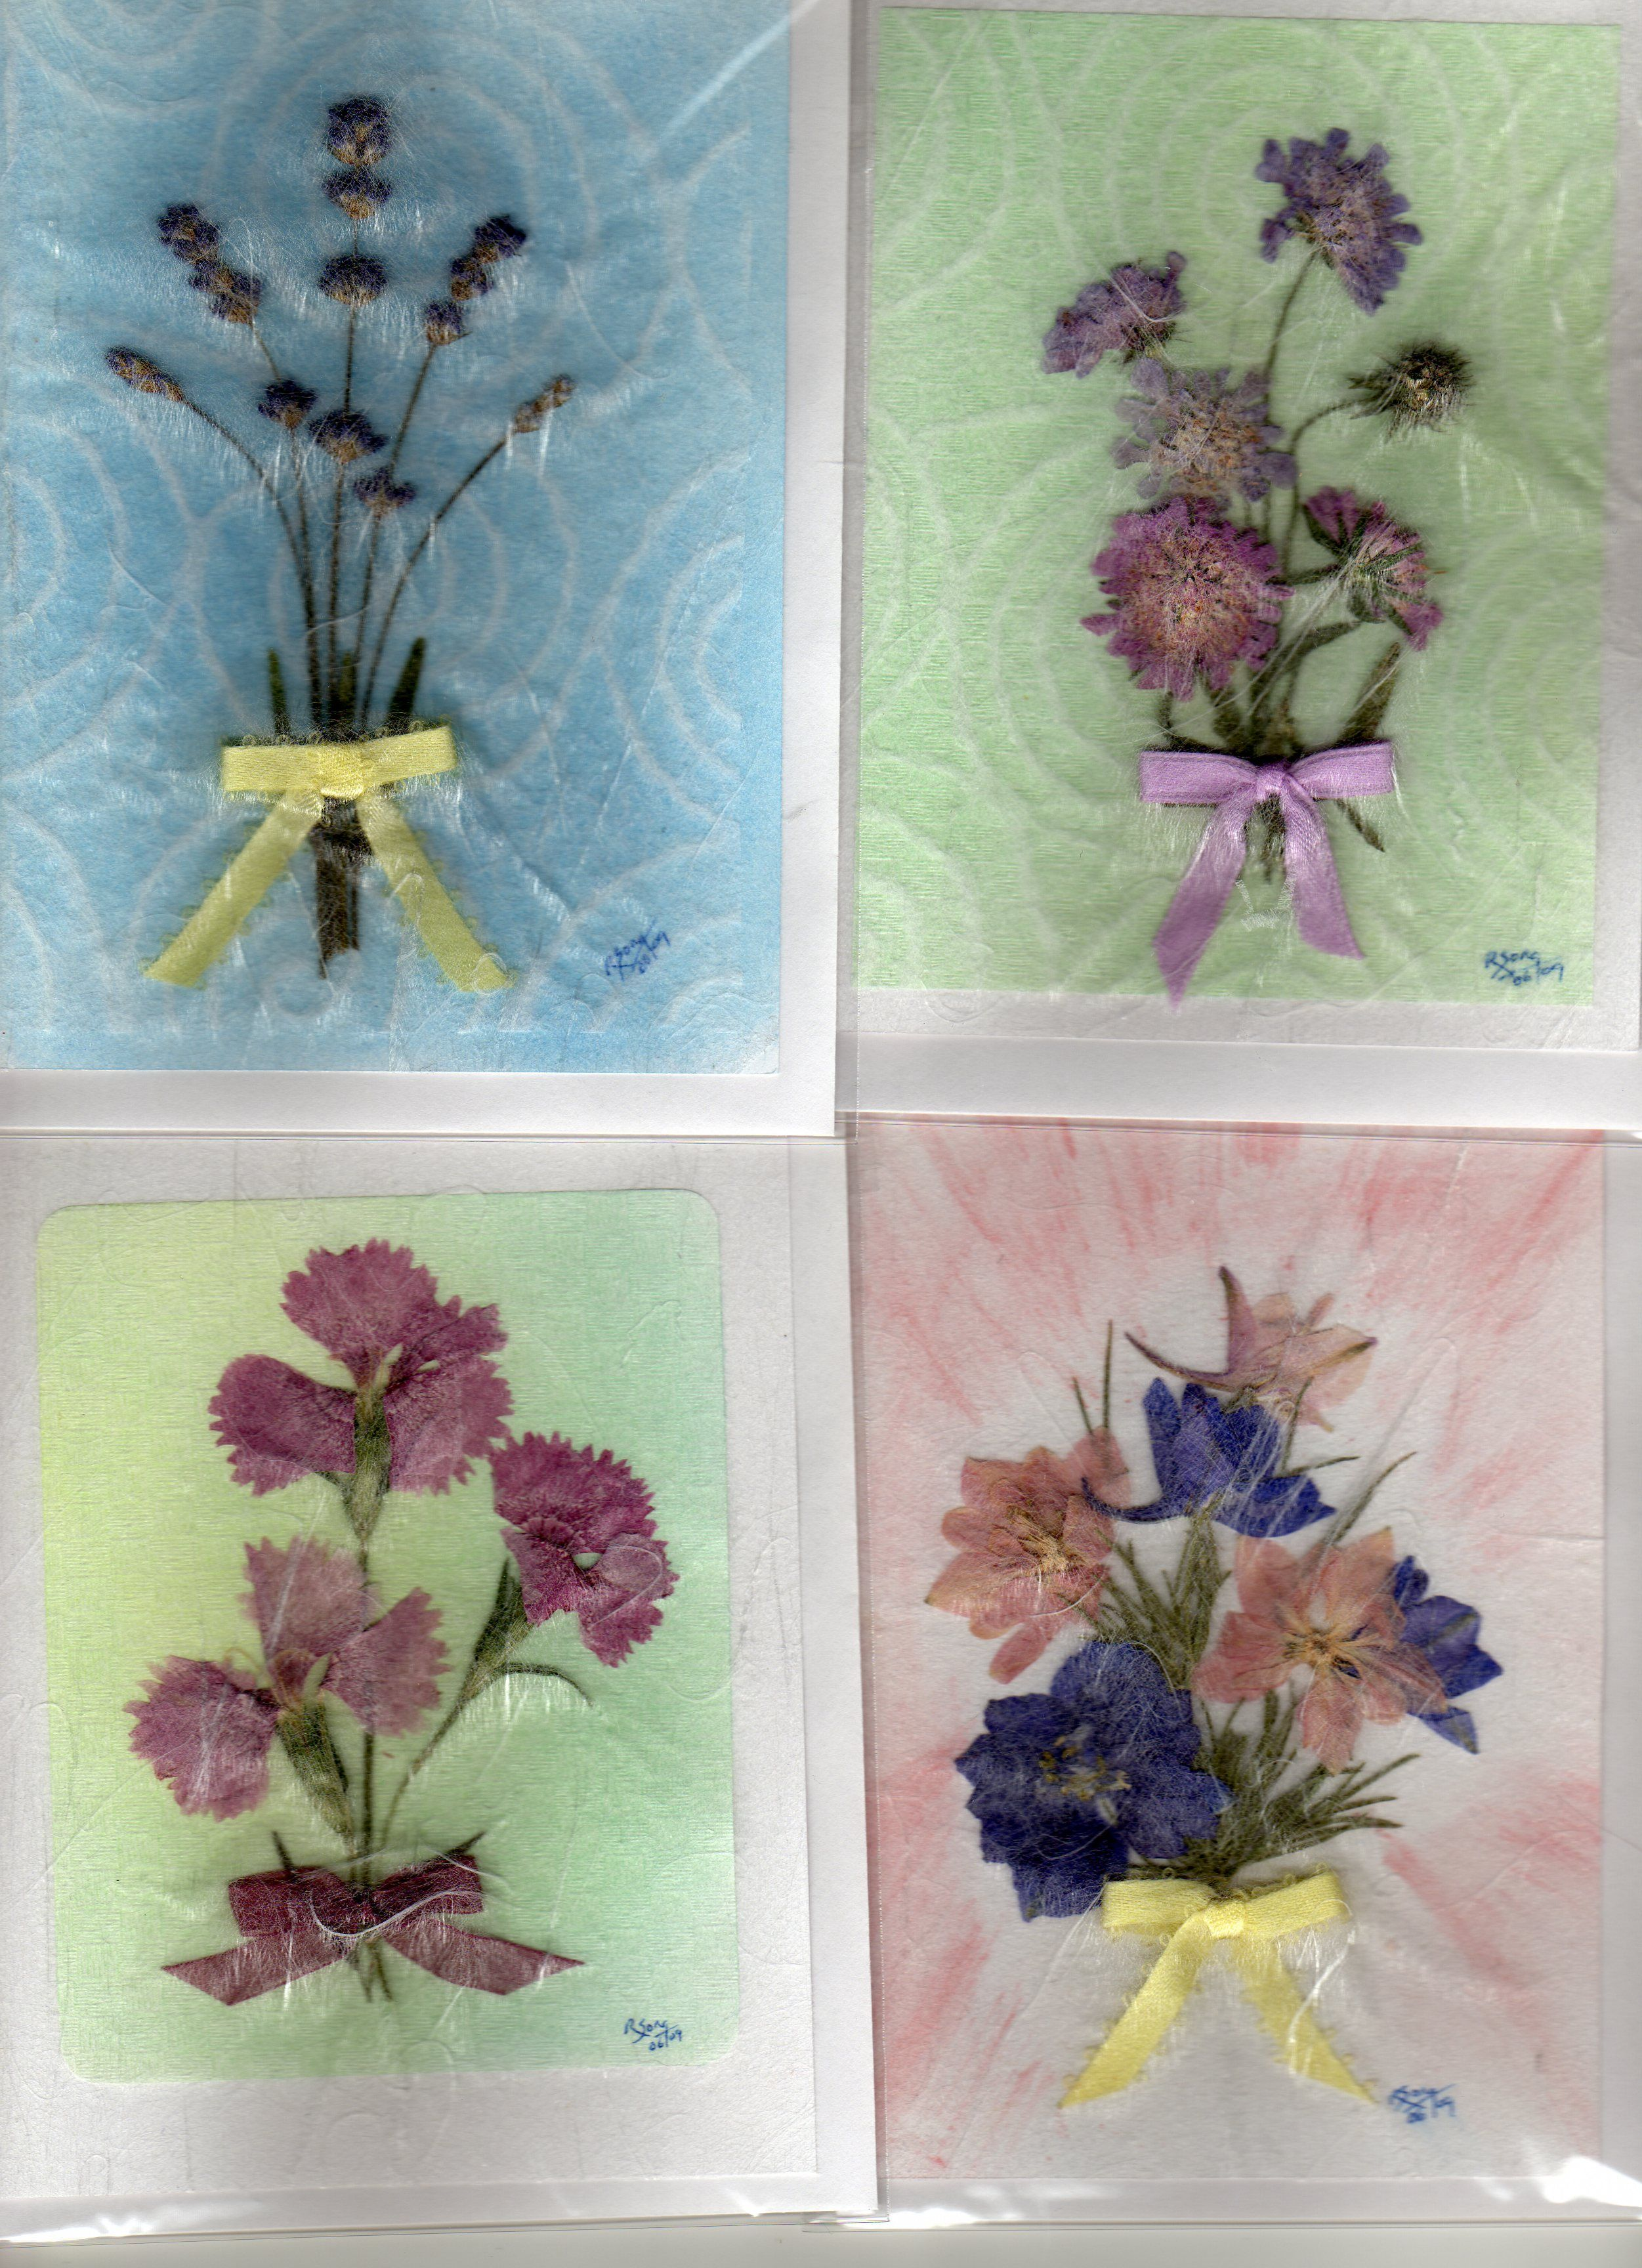 Bouquets  With Sanwa Paper Preserving Flowersleaf Skeletonpressed Flower Artdry